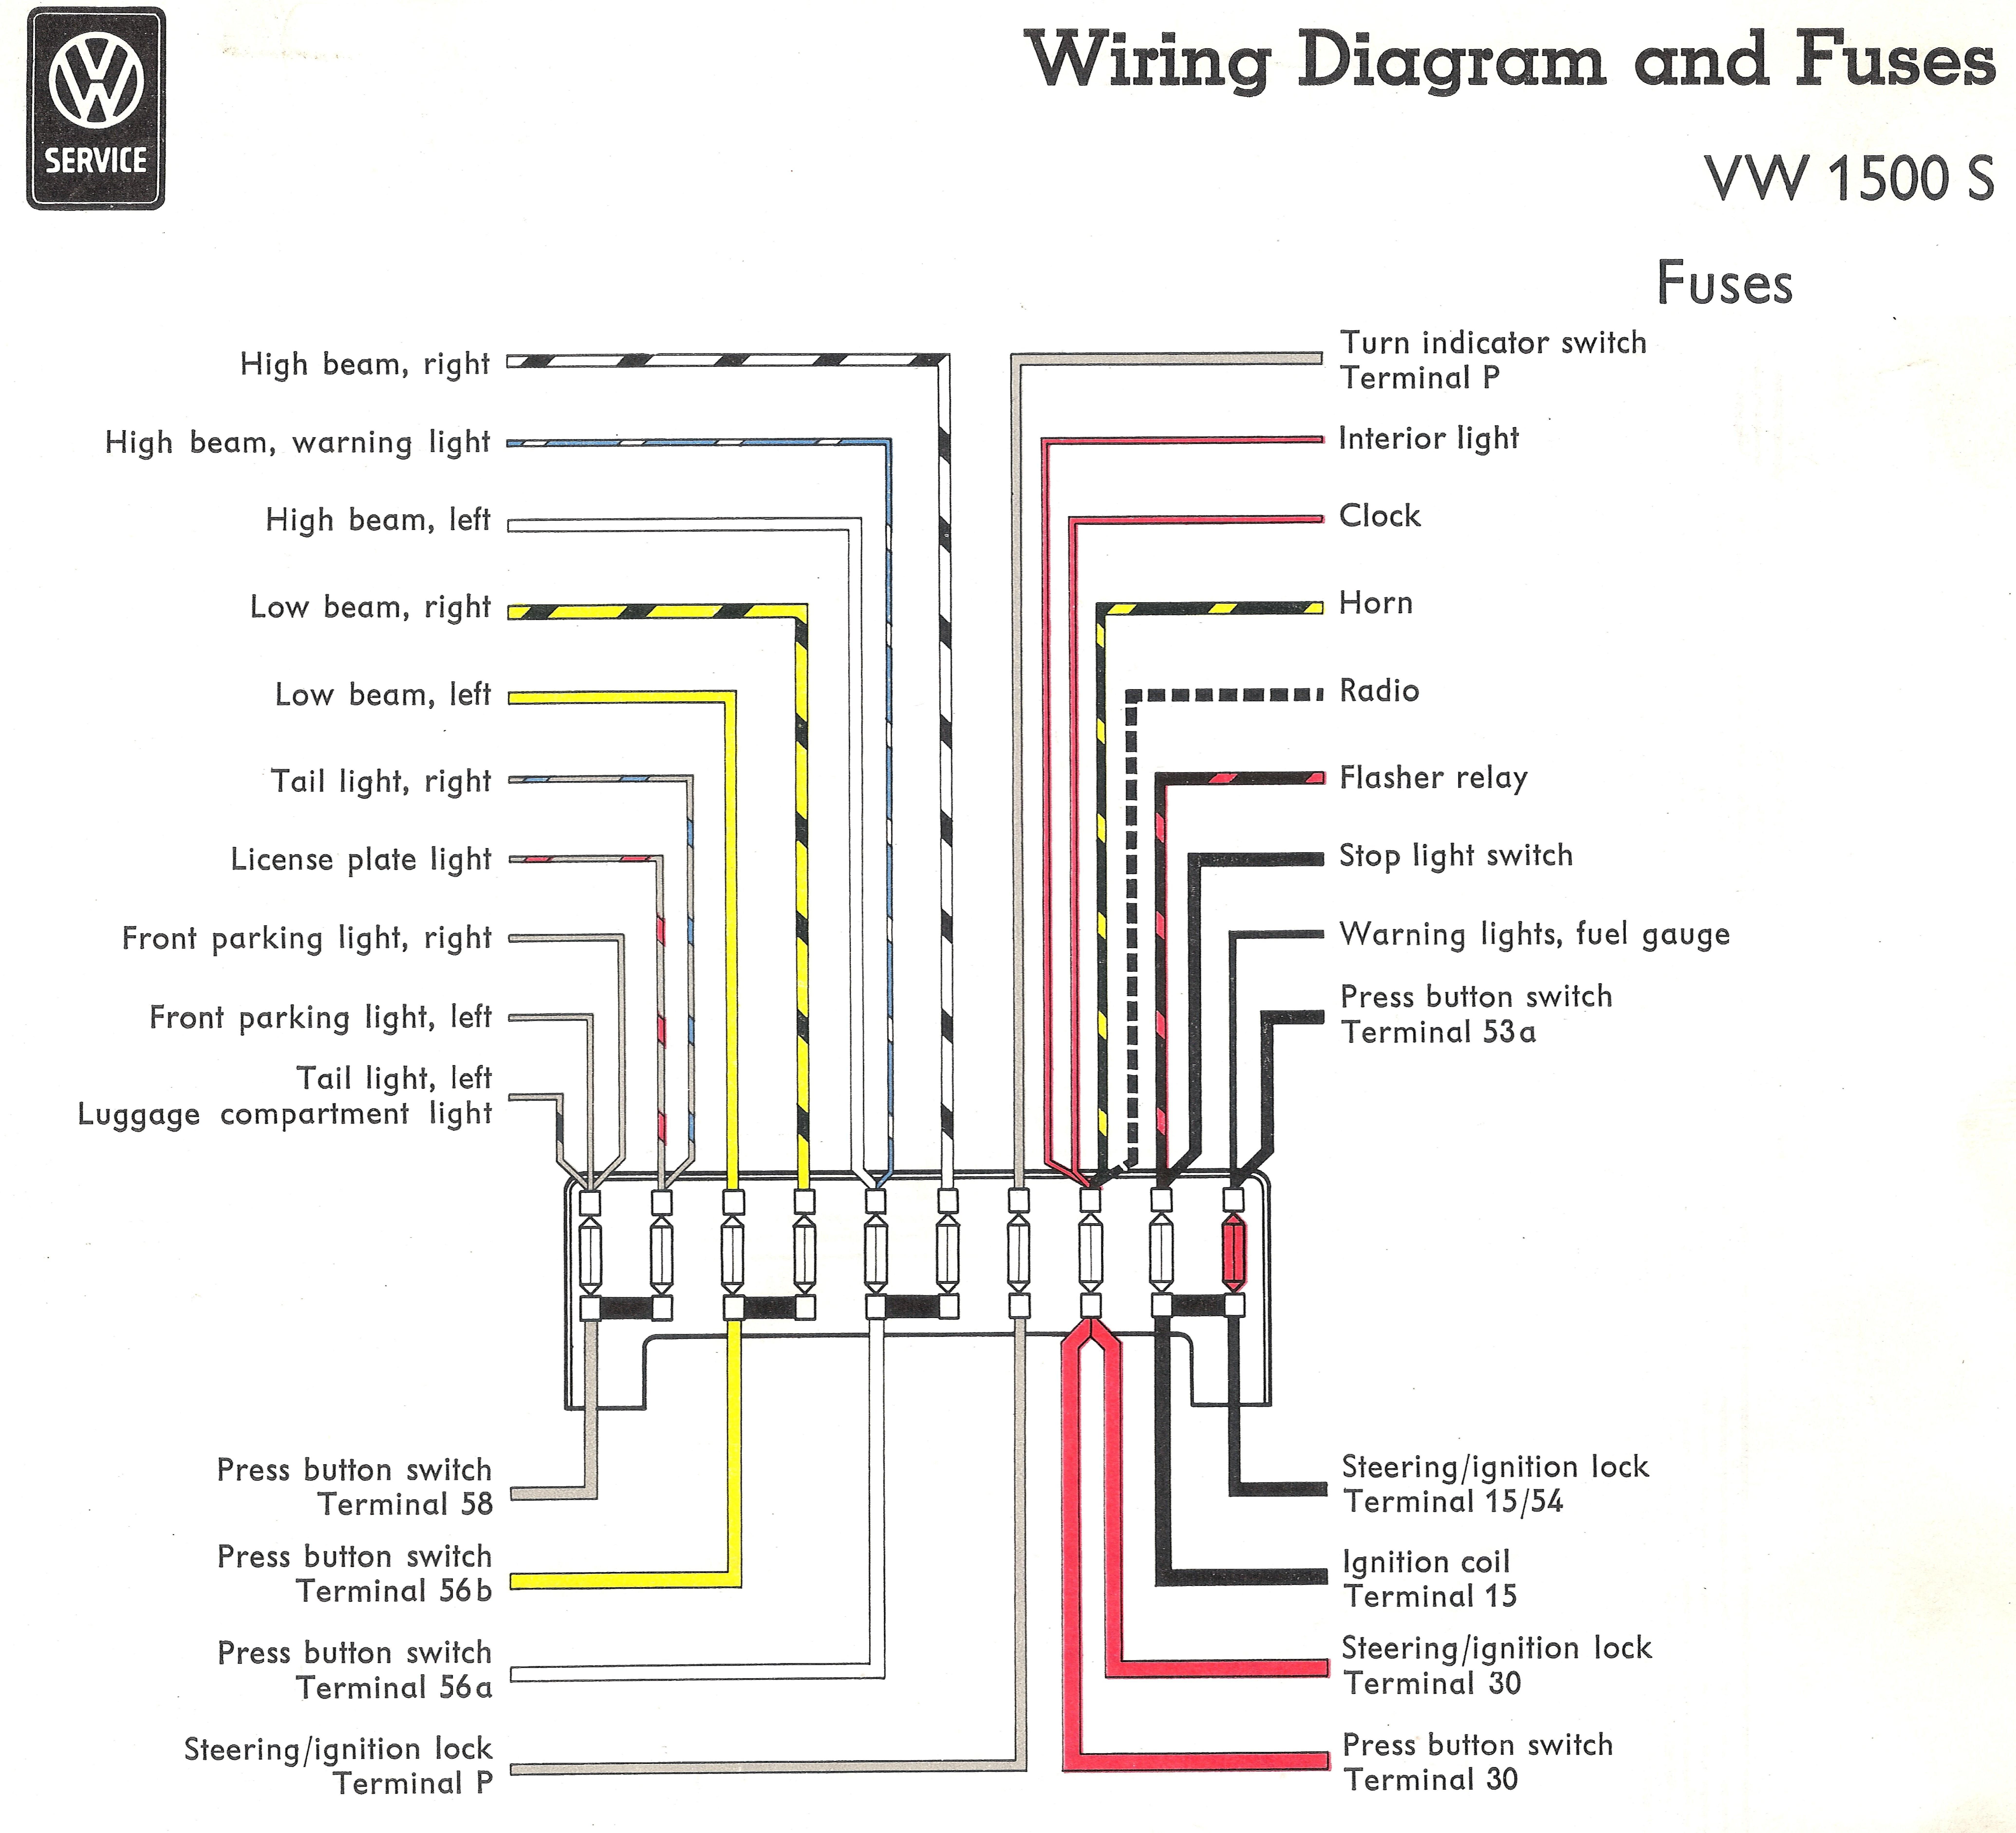 Vw Passat Engine Parts Diagram Vw Wiring and Fuses Wiring Info • Of Vw Passat Engine Parts Diagram